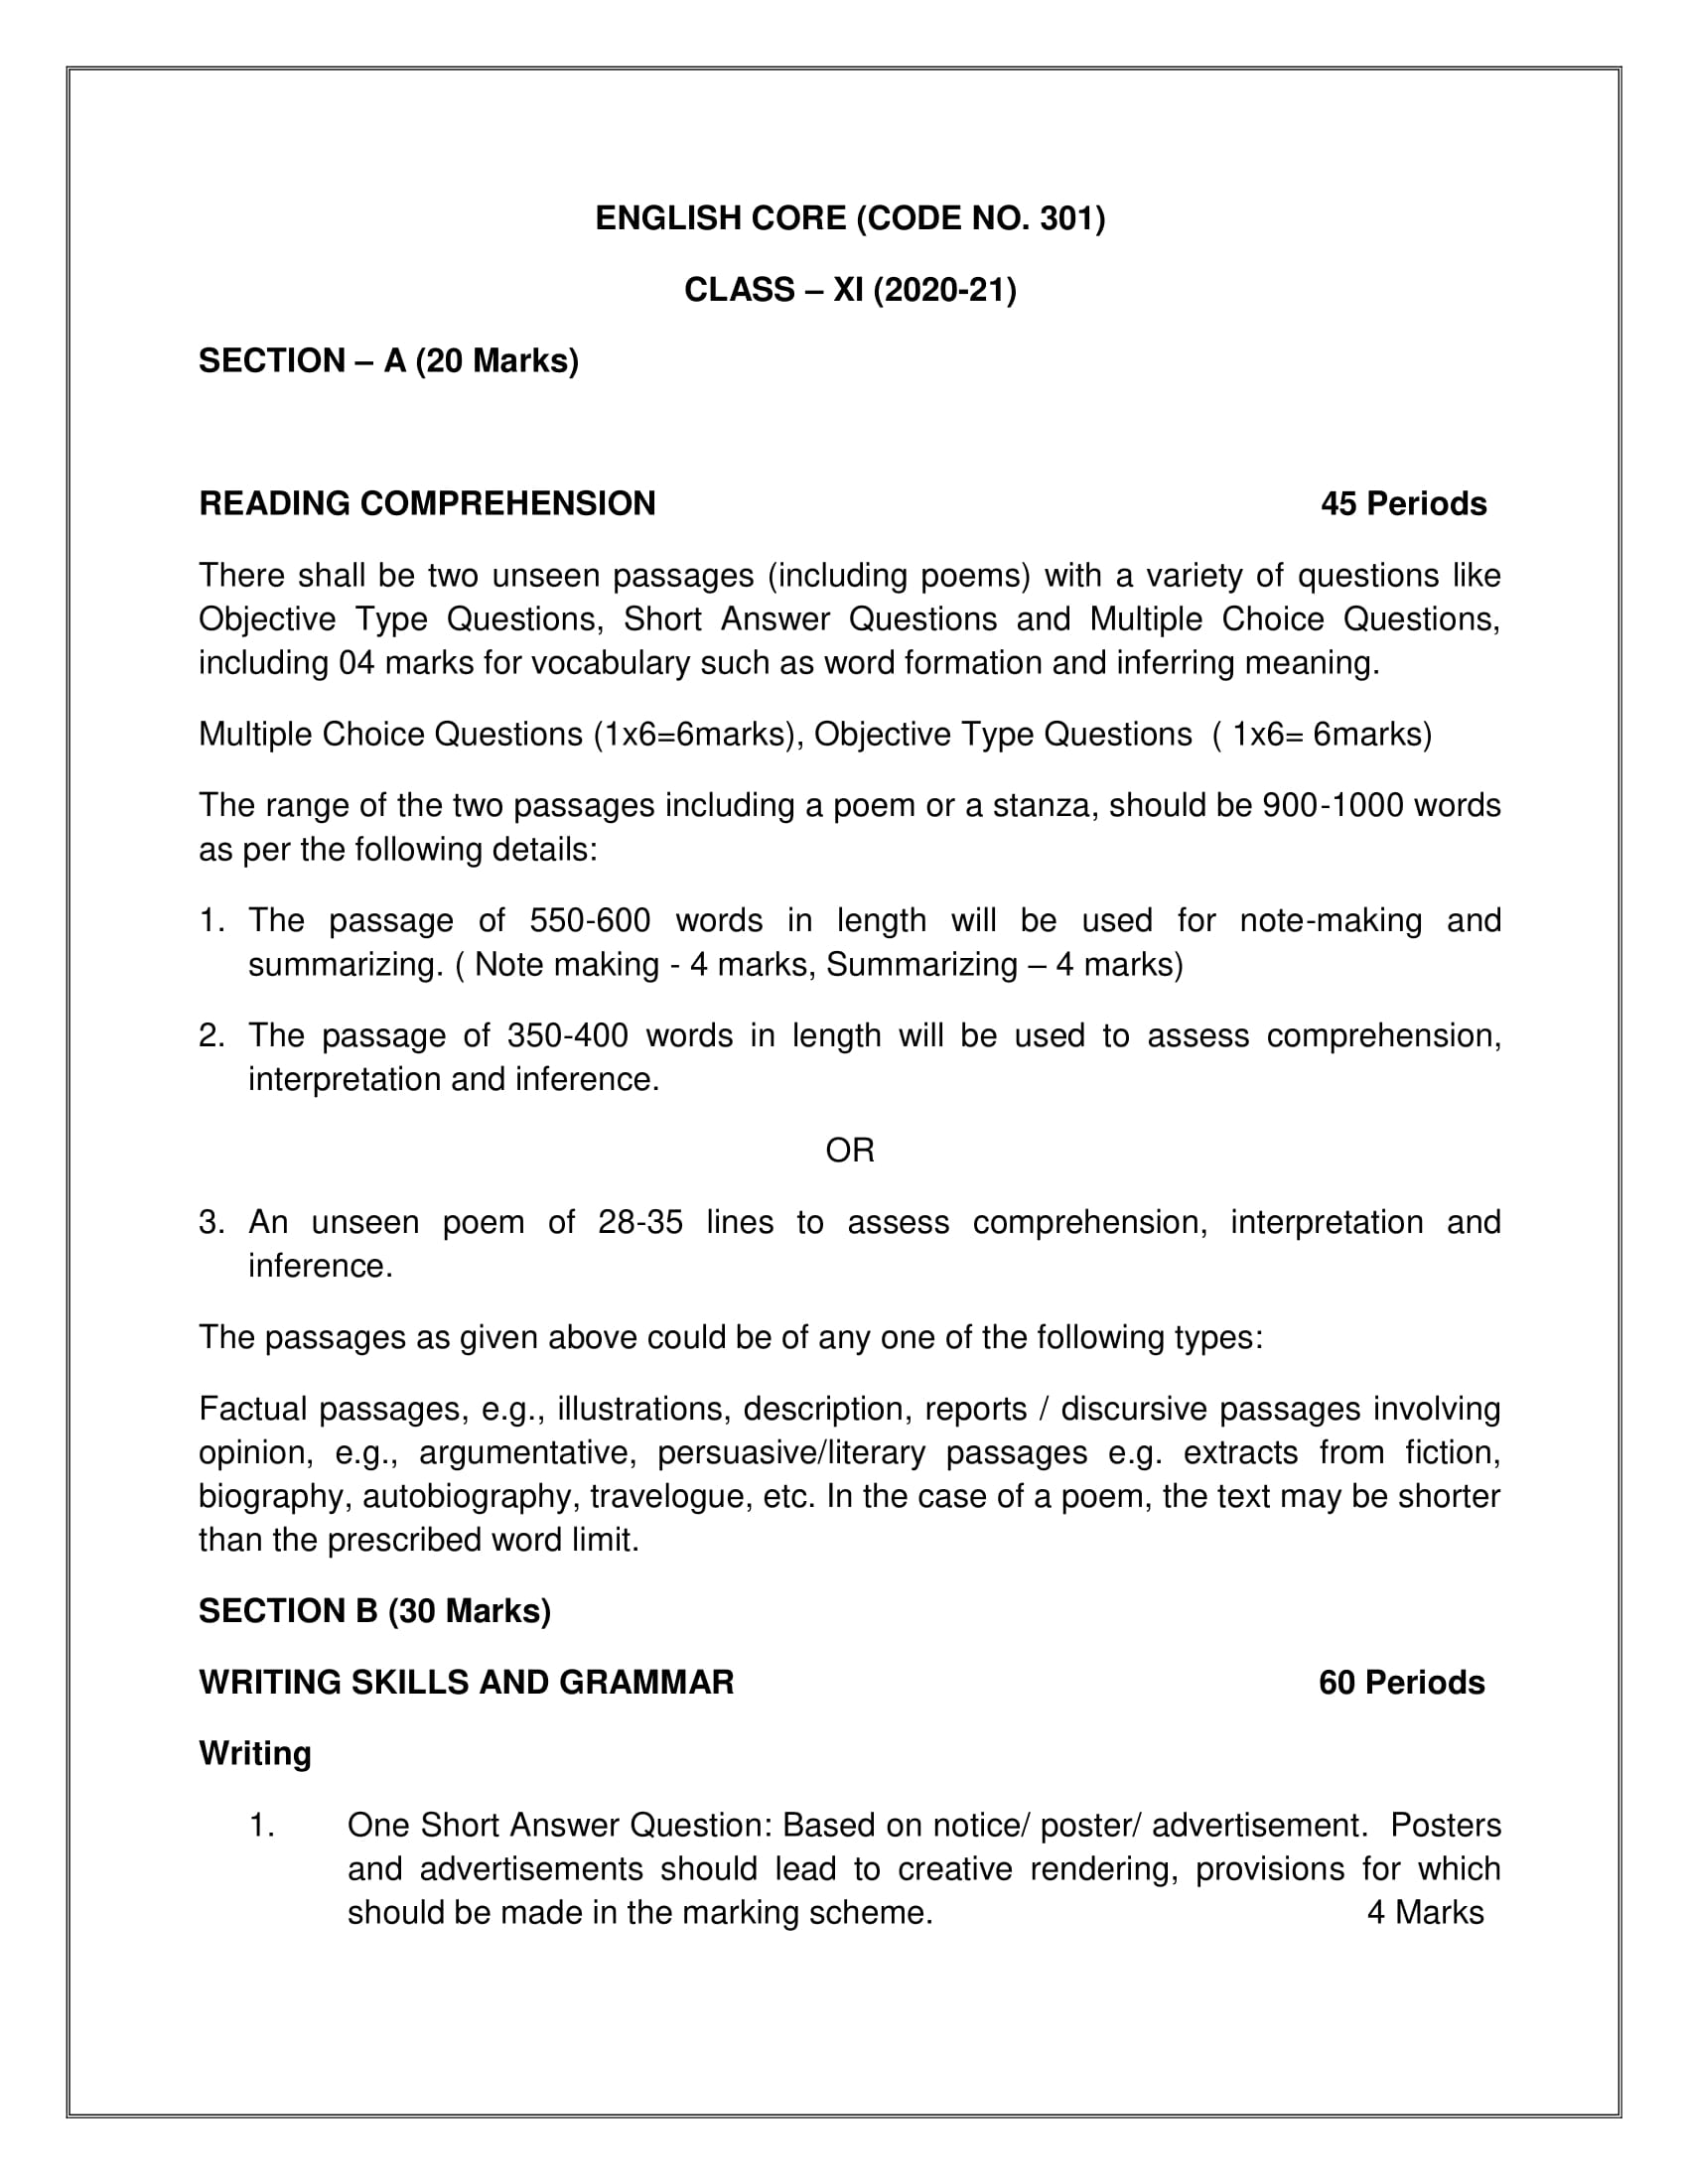 English.core Sr.Sec 2020 21 07